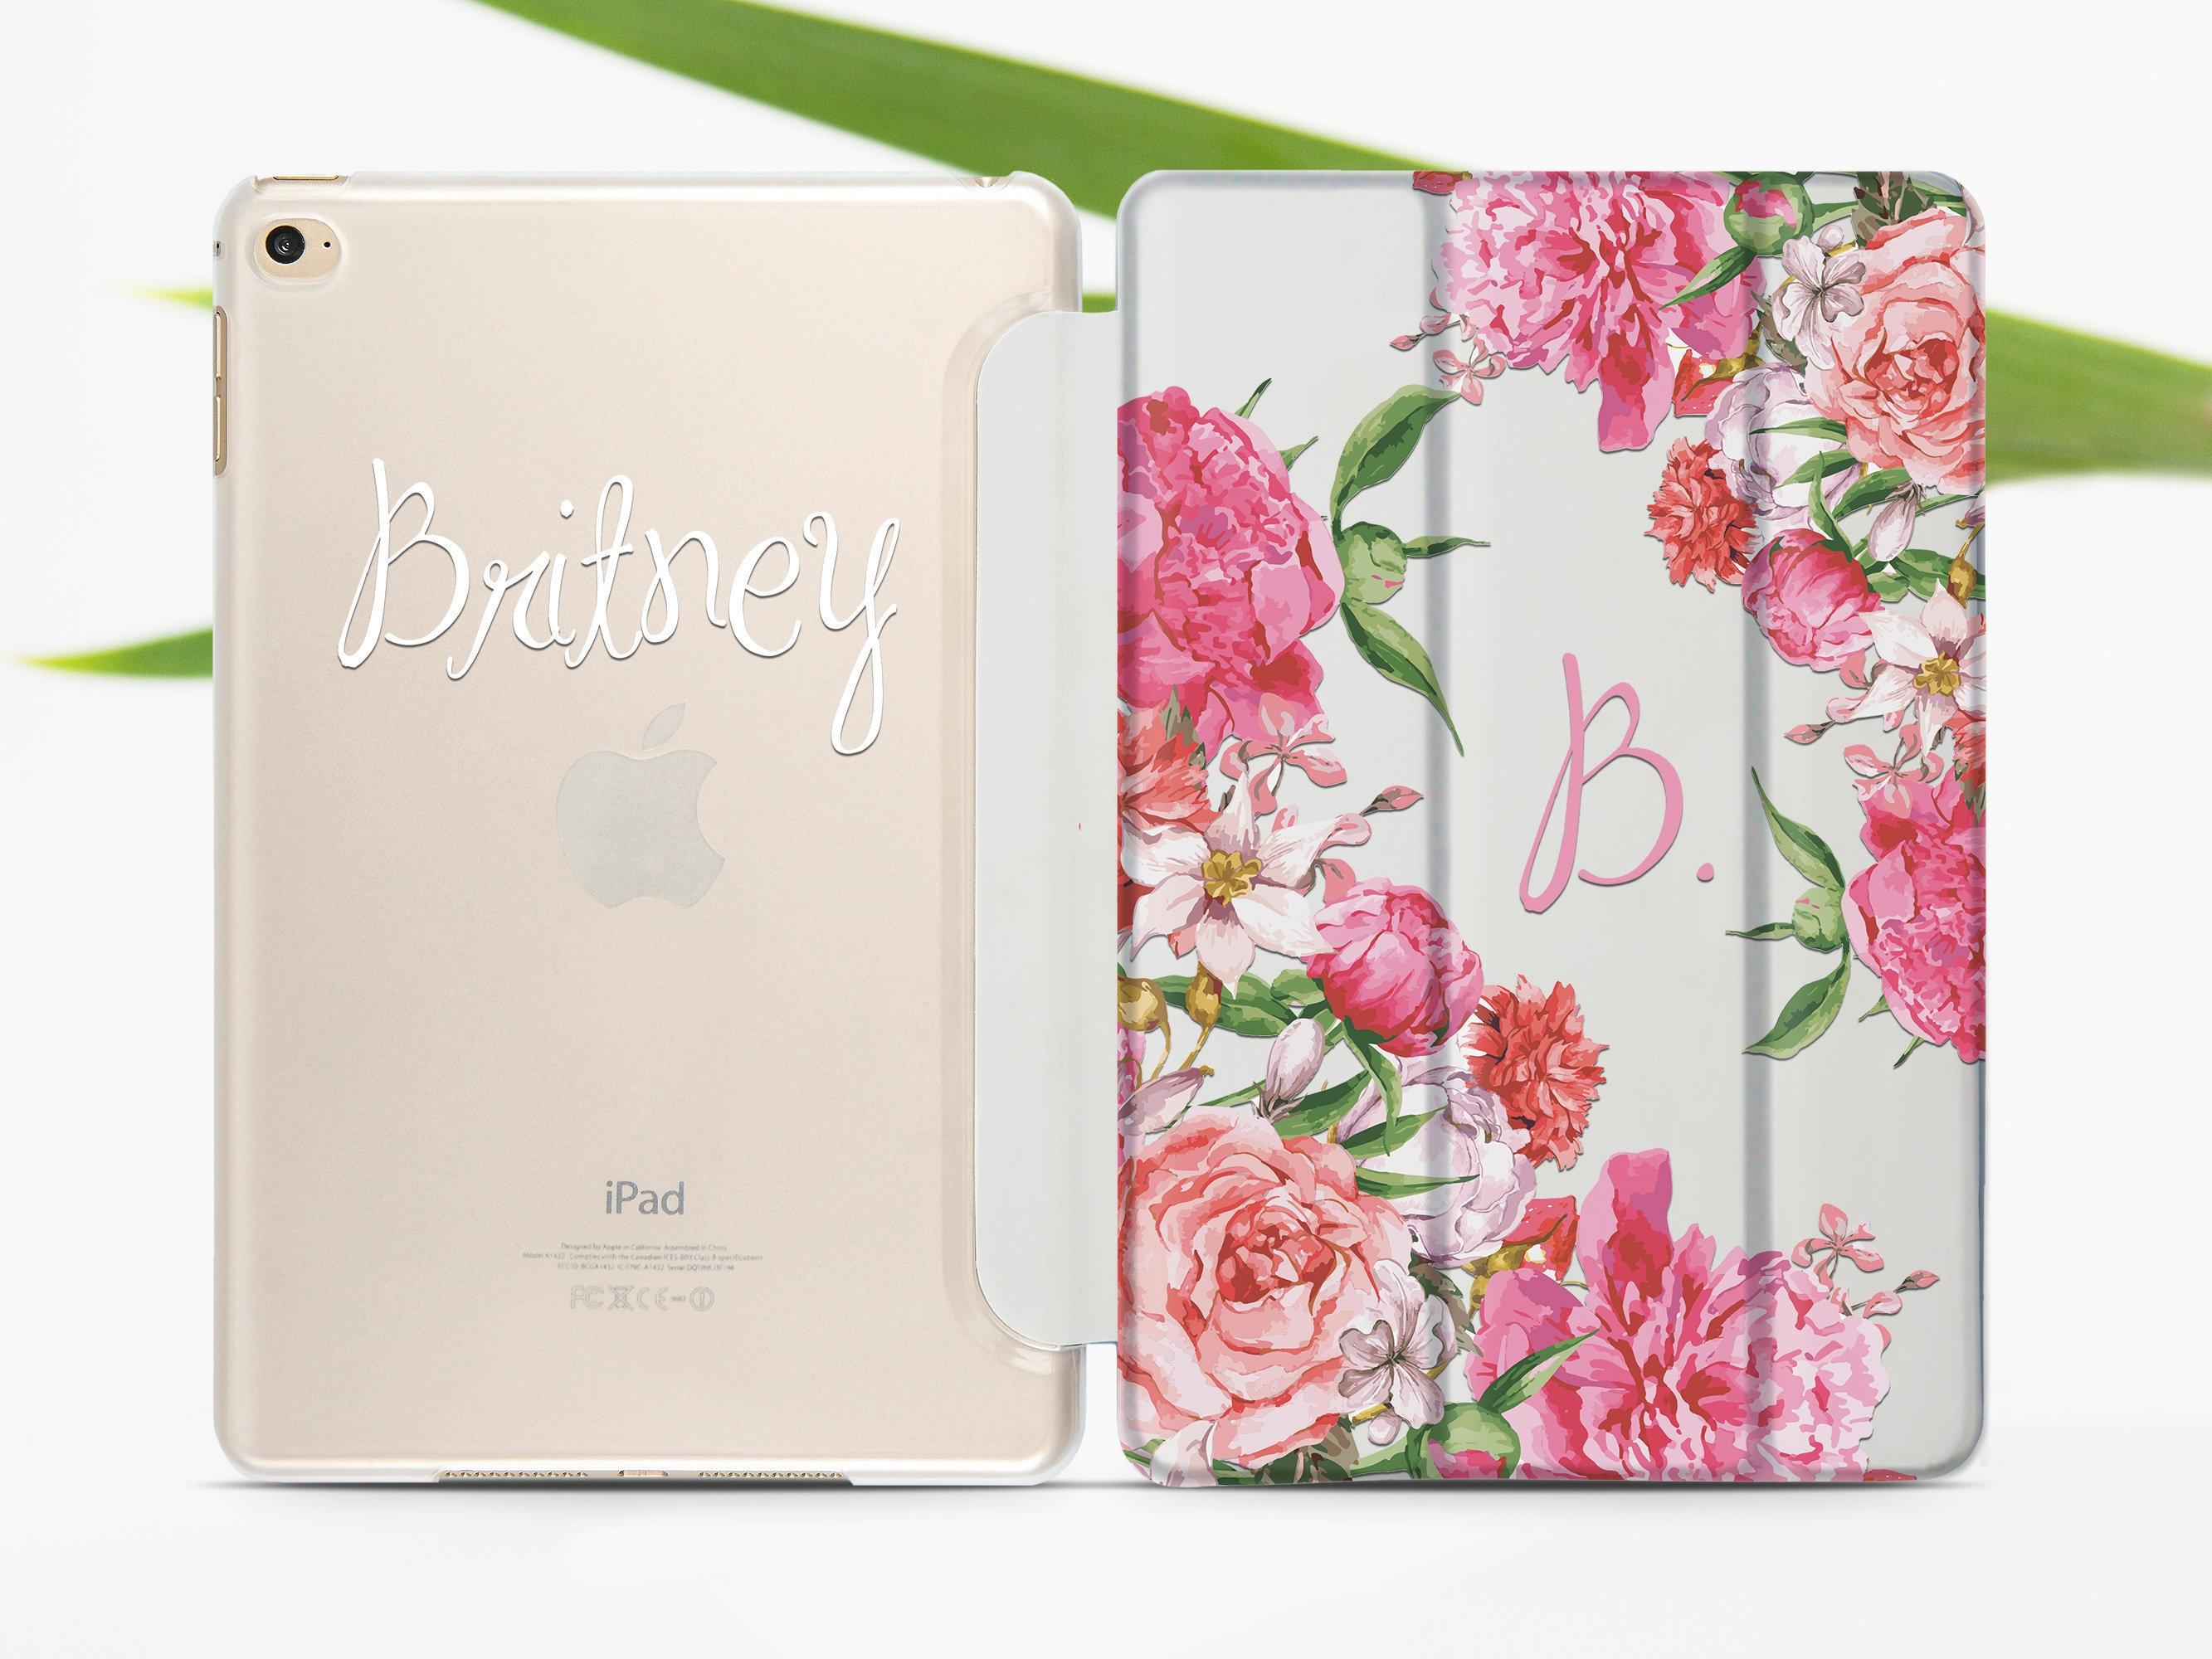 newest 61208 81c67 Custom iPad Mini 5 2019 Case iPad Air 3 2019 Personalized Smart Cover iPad  Pro 10.5 Case Clear iPad 12.9 Case iPad 9.7 2017 Case 696D4501